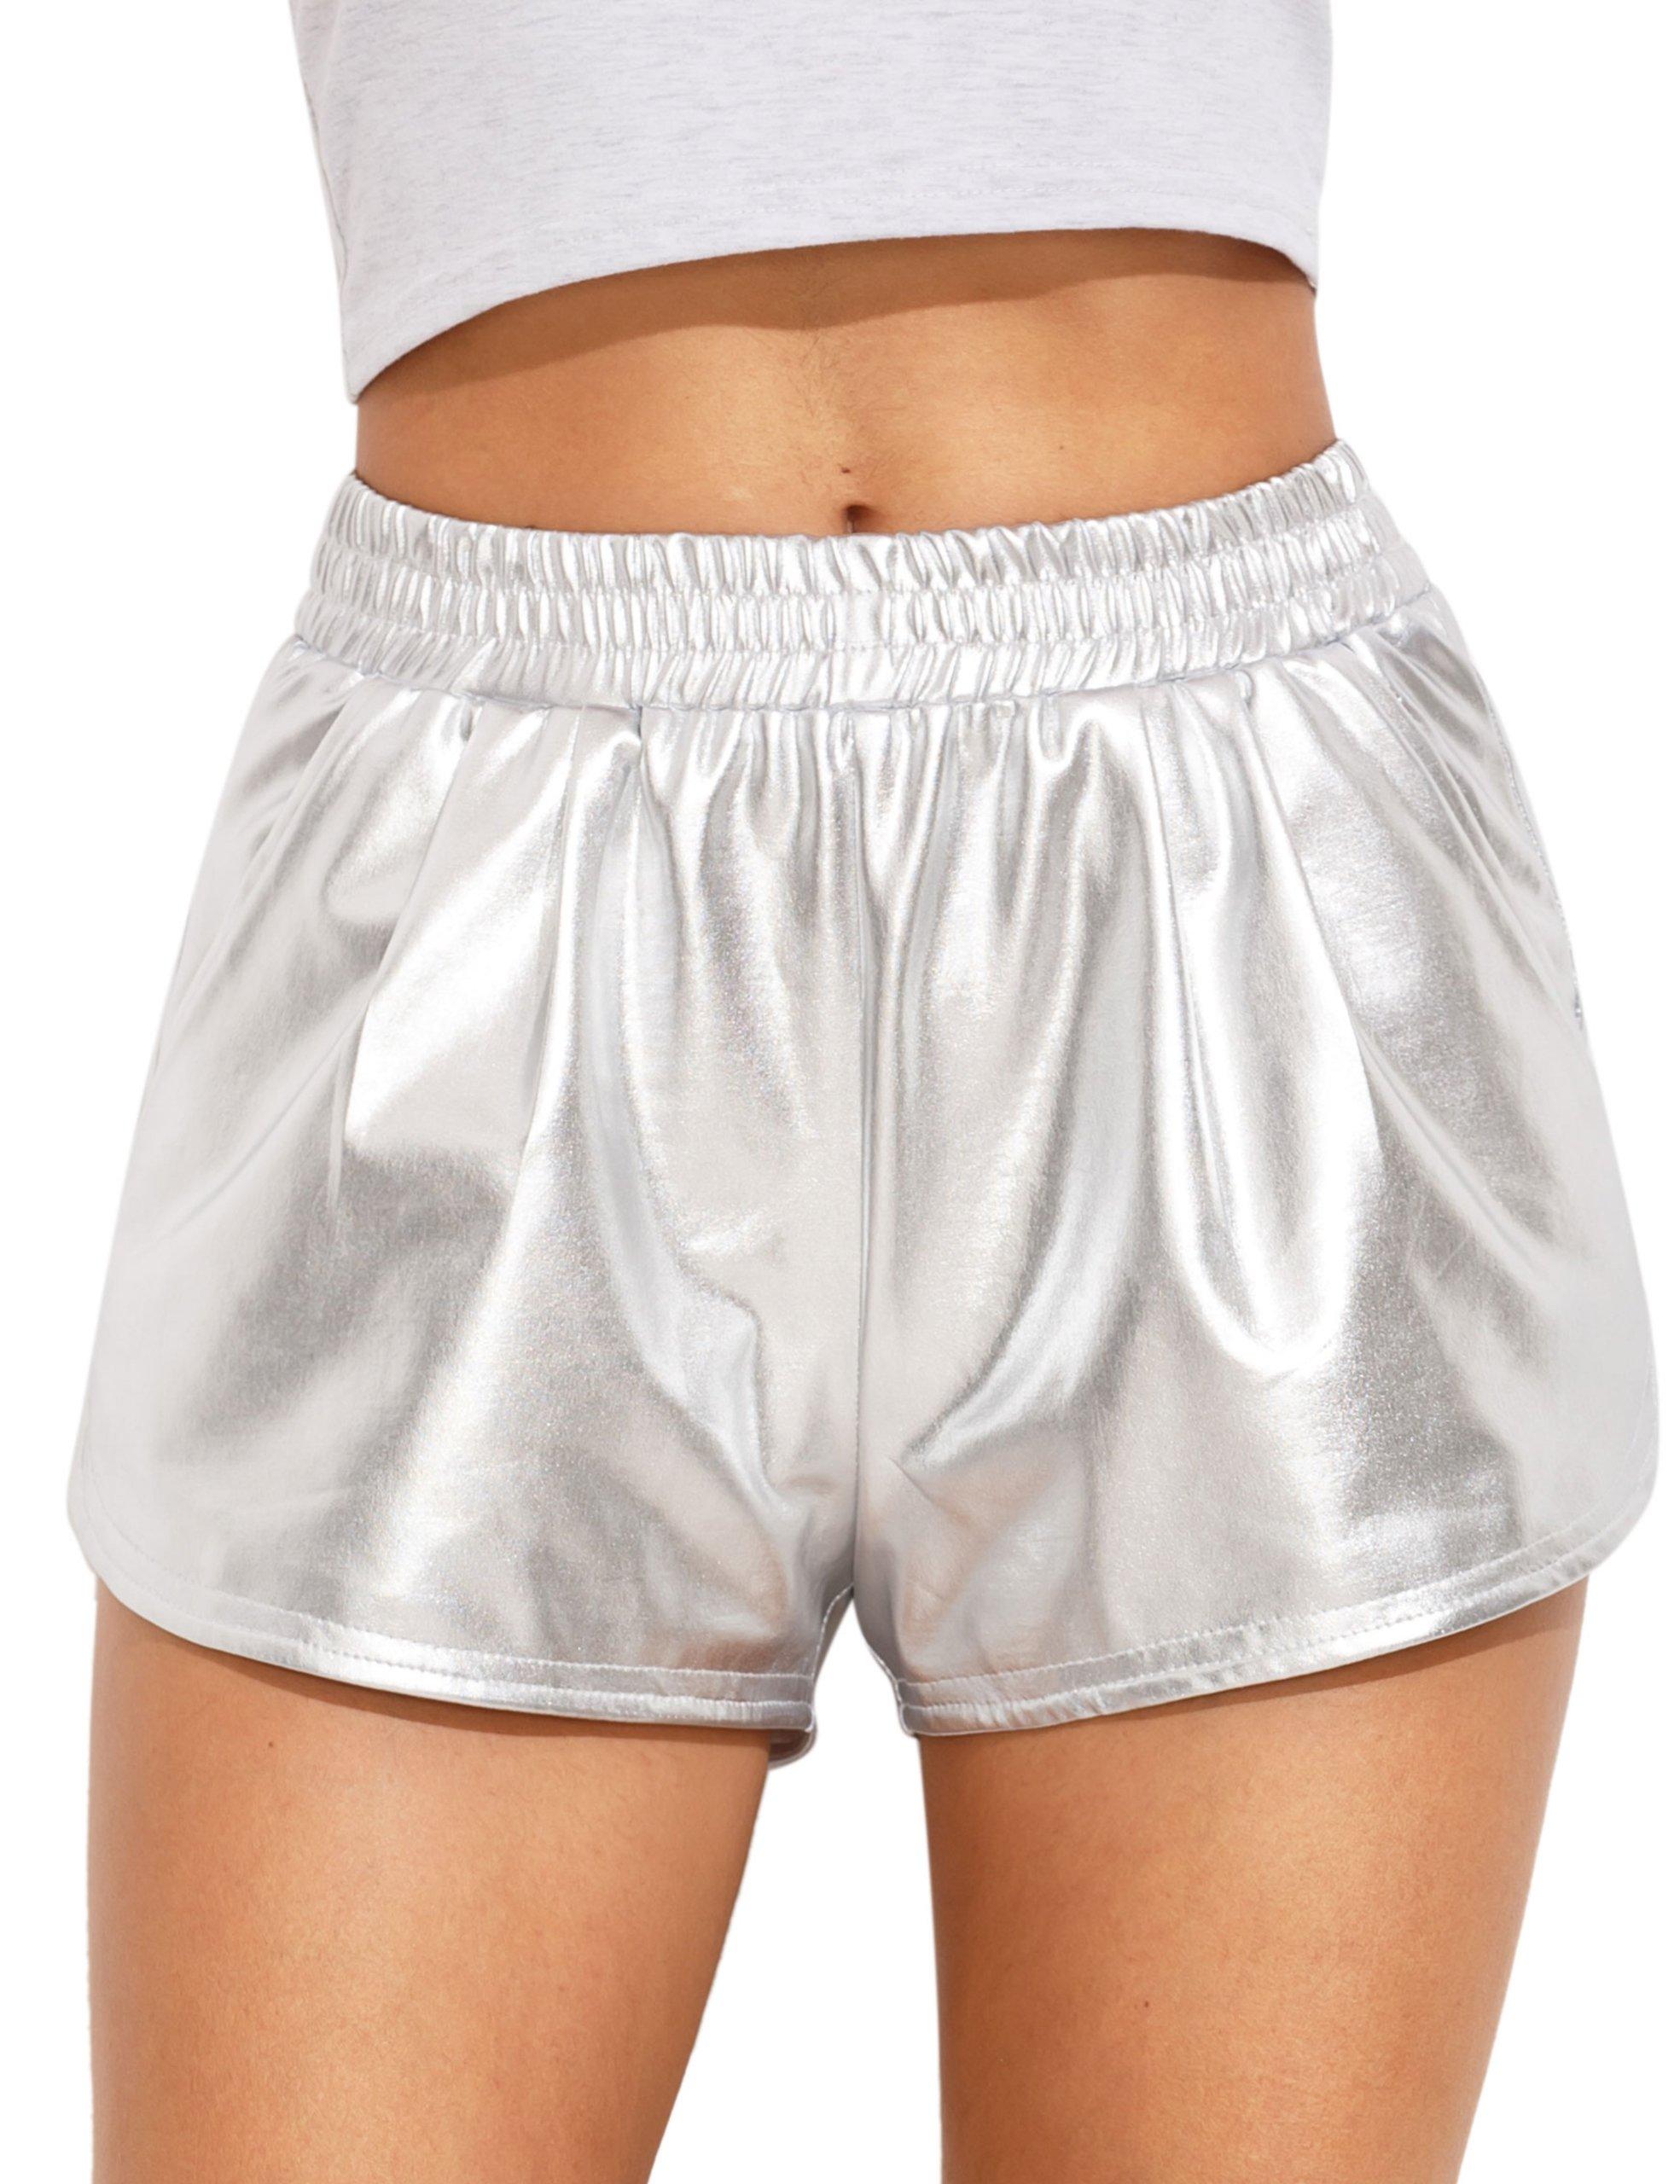 SweatyRocks Women Shorts Yoga Shorts Jogger Running Athletic Hot Shorts, Silver Silver Small